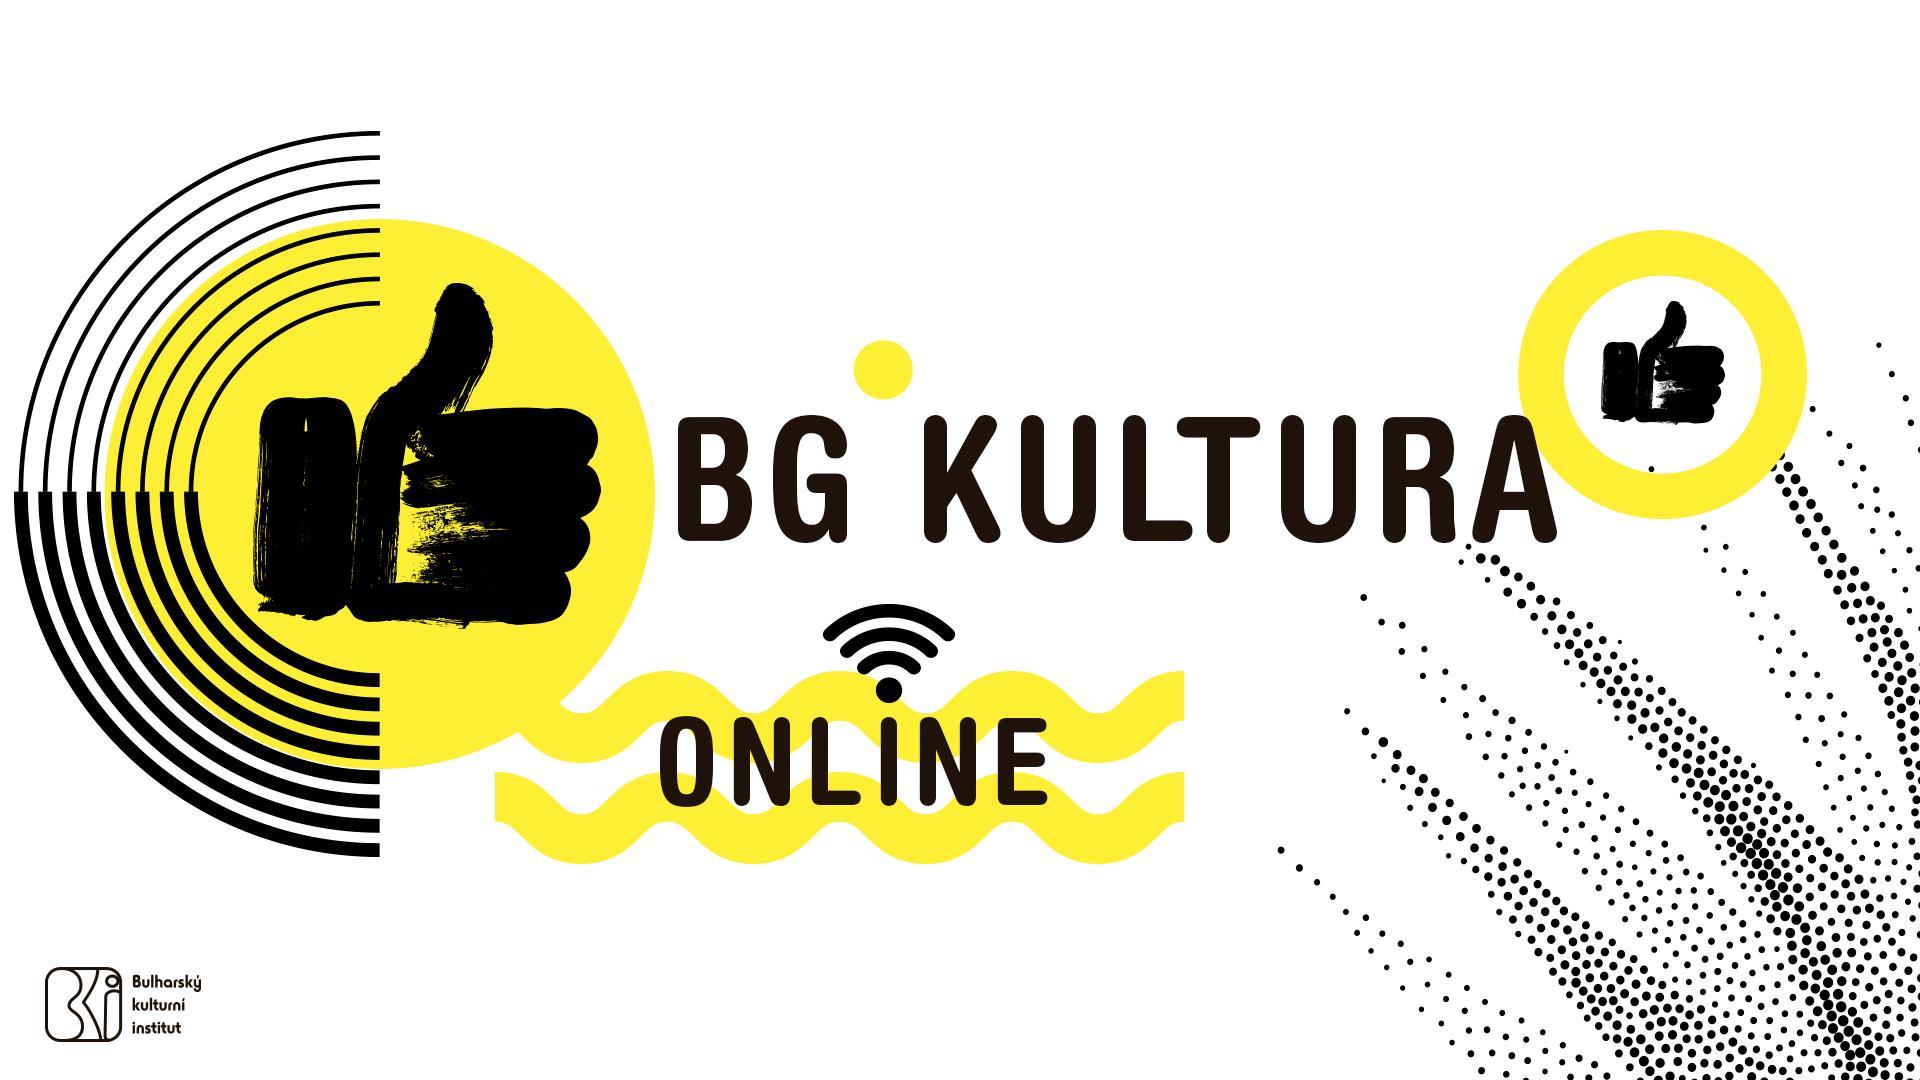 BKI_BG_KULTURA_Facebook_event_cover